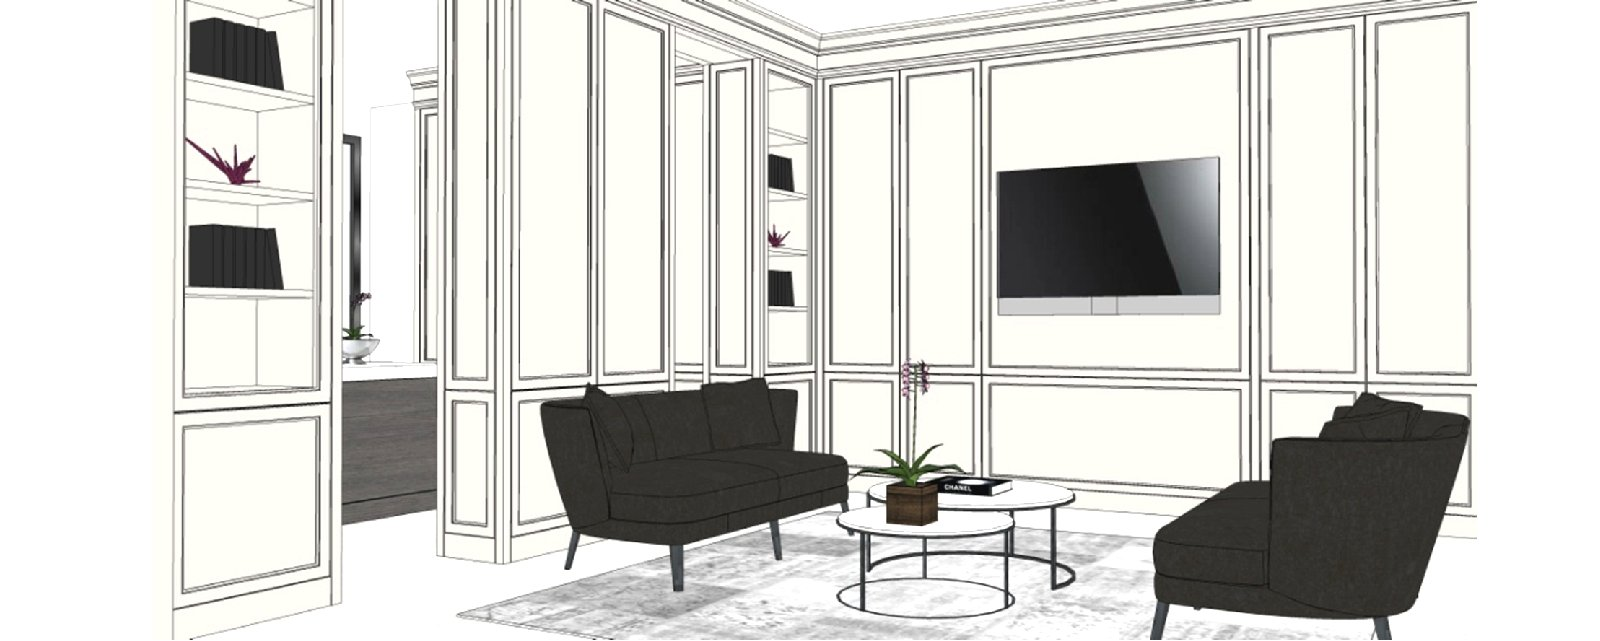 3D TV room